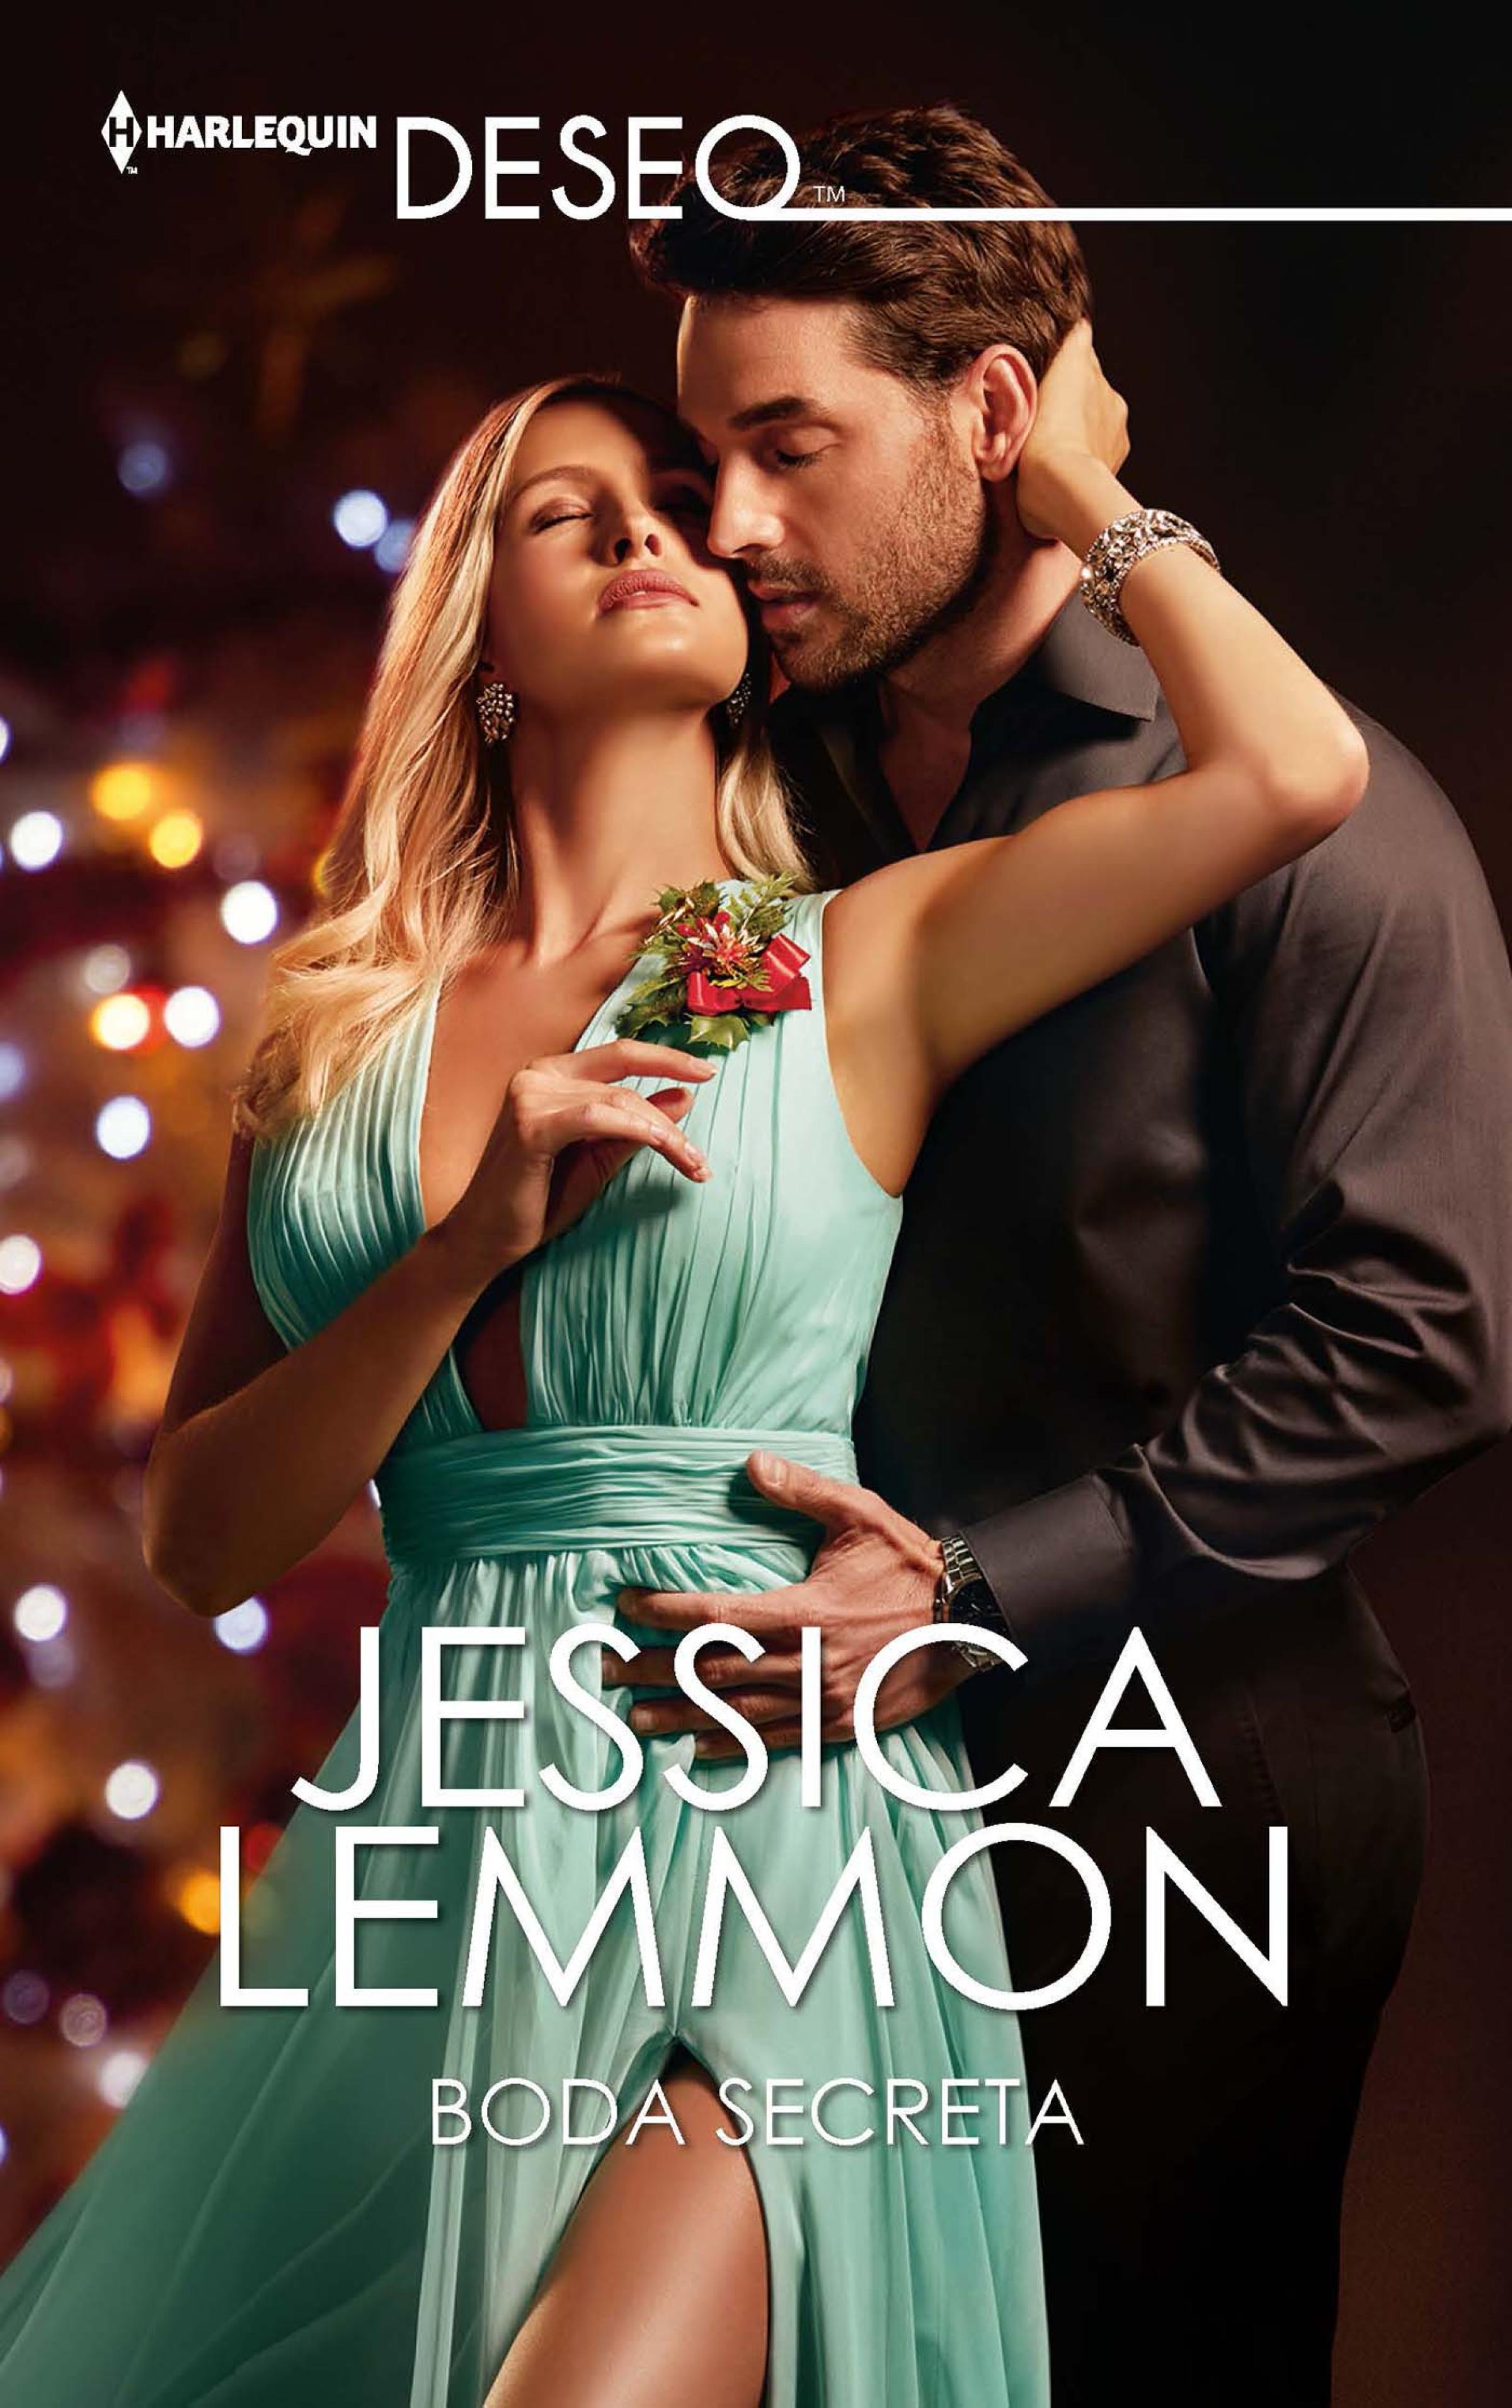 Jessica Lemmon Boda secreta barbara cartland boda secreta